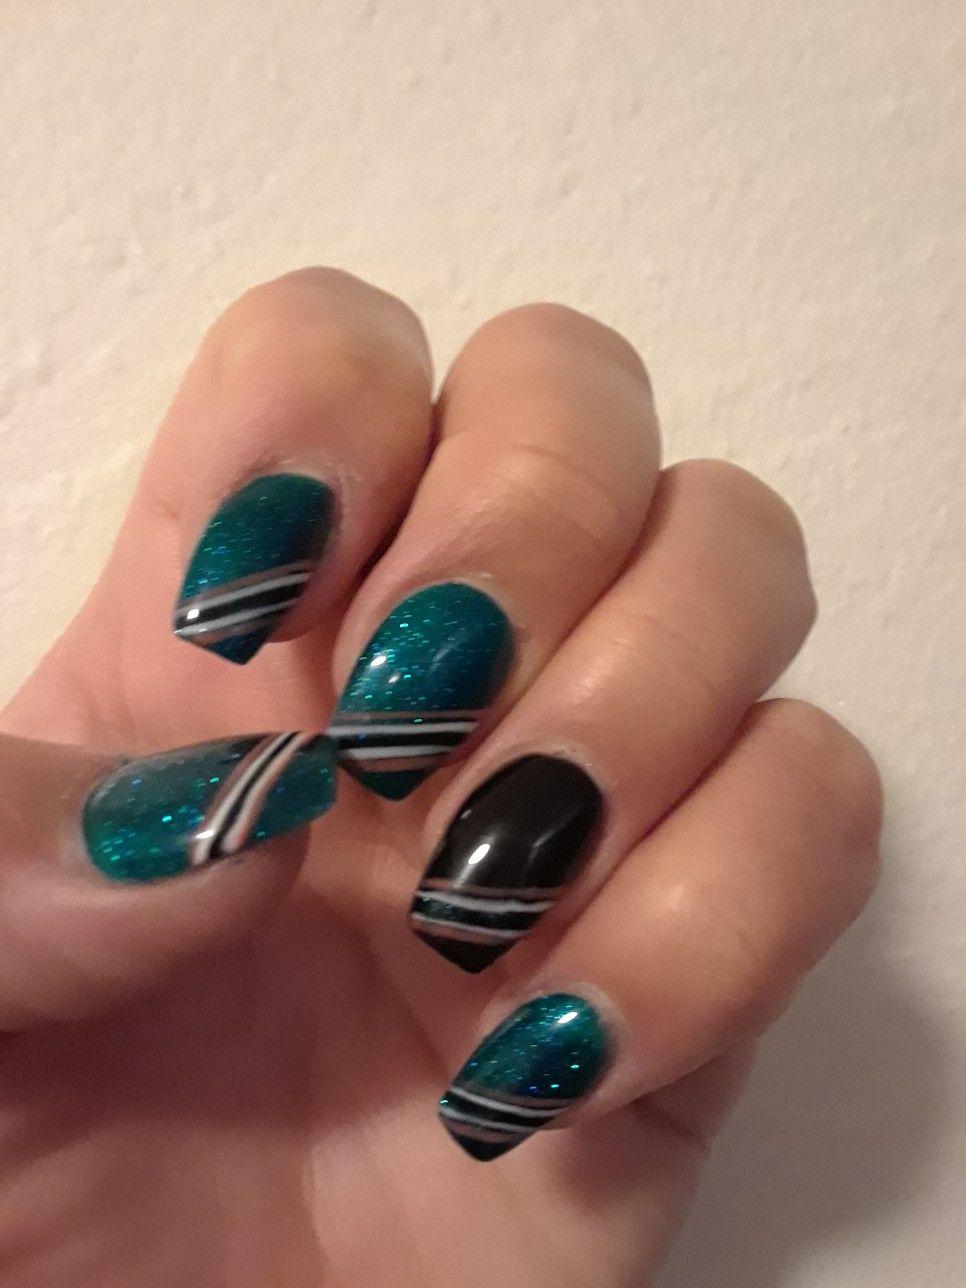 Pin By Esmeralda Gallardo Rodriguez On My Team Toe Nail Art Toe Nails Nails